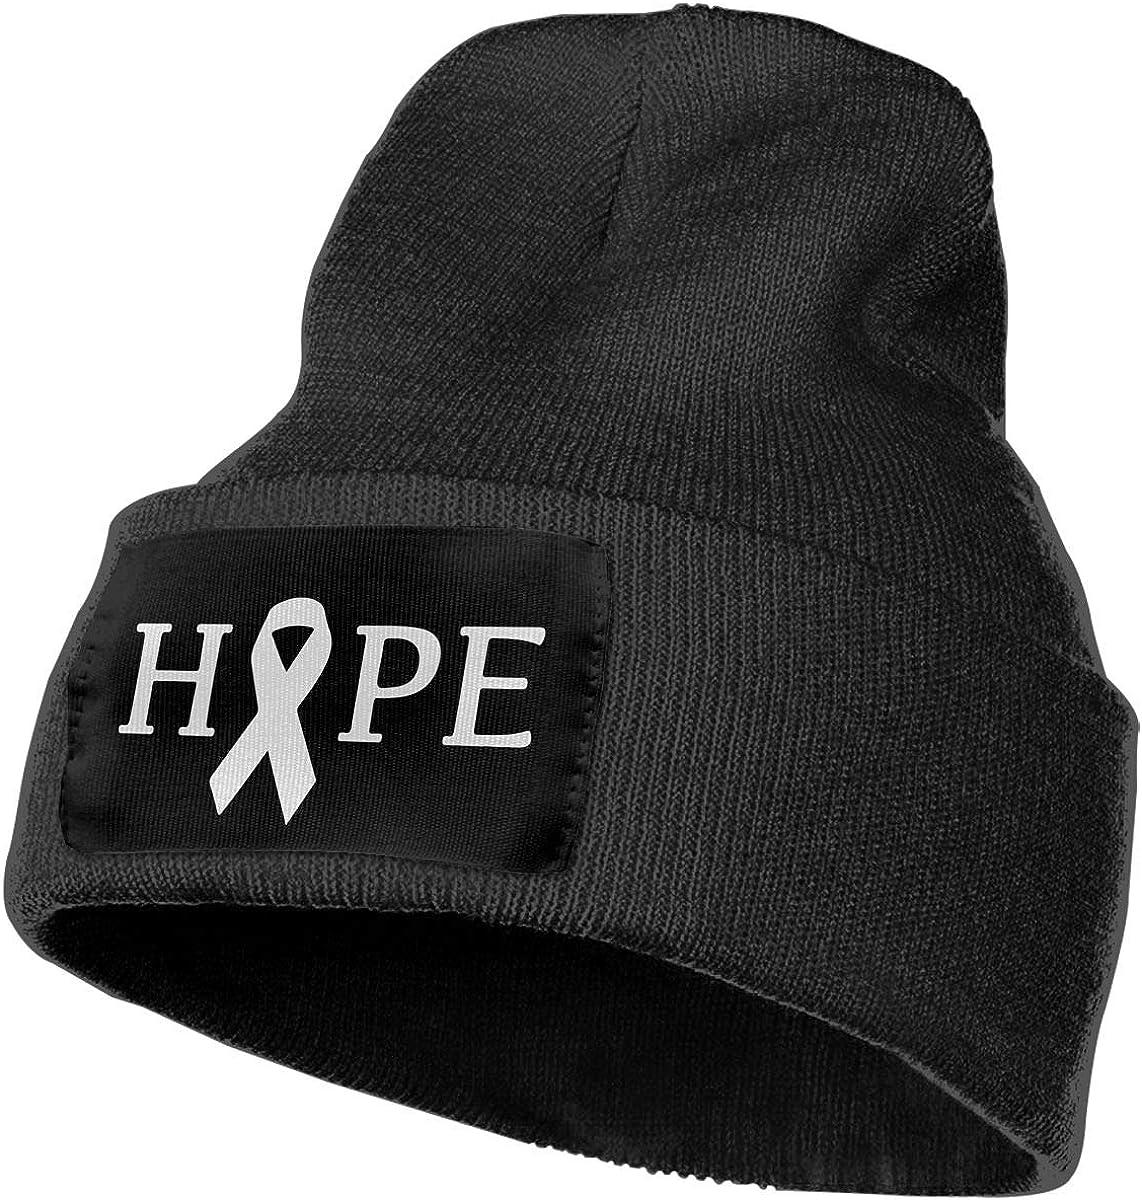 COLLJL-8 Men /& Women Hope Lung Cancer Outdoor Warm Knit Beanies Hat Soft Winter Skull Caps